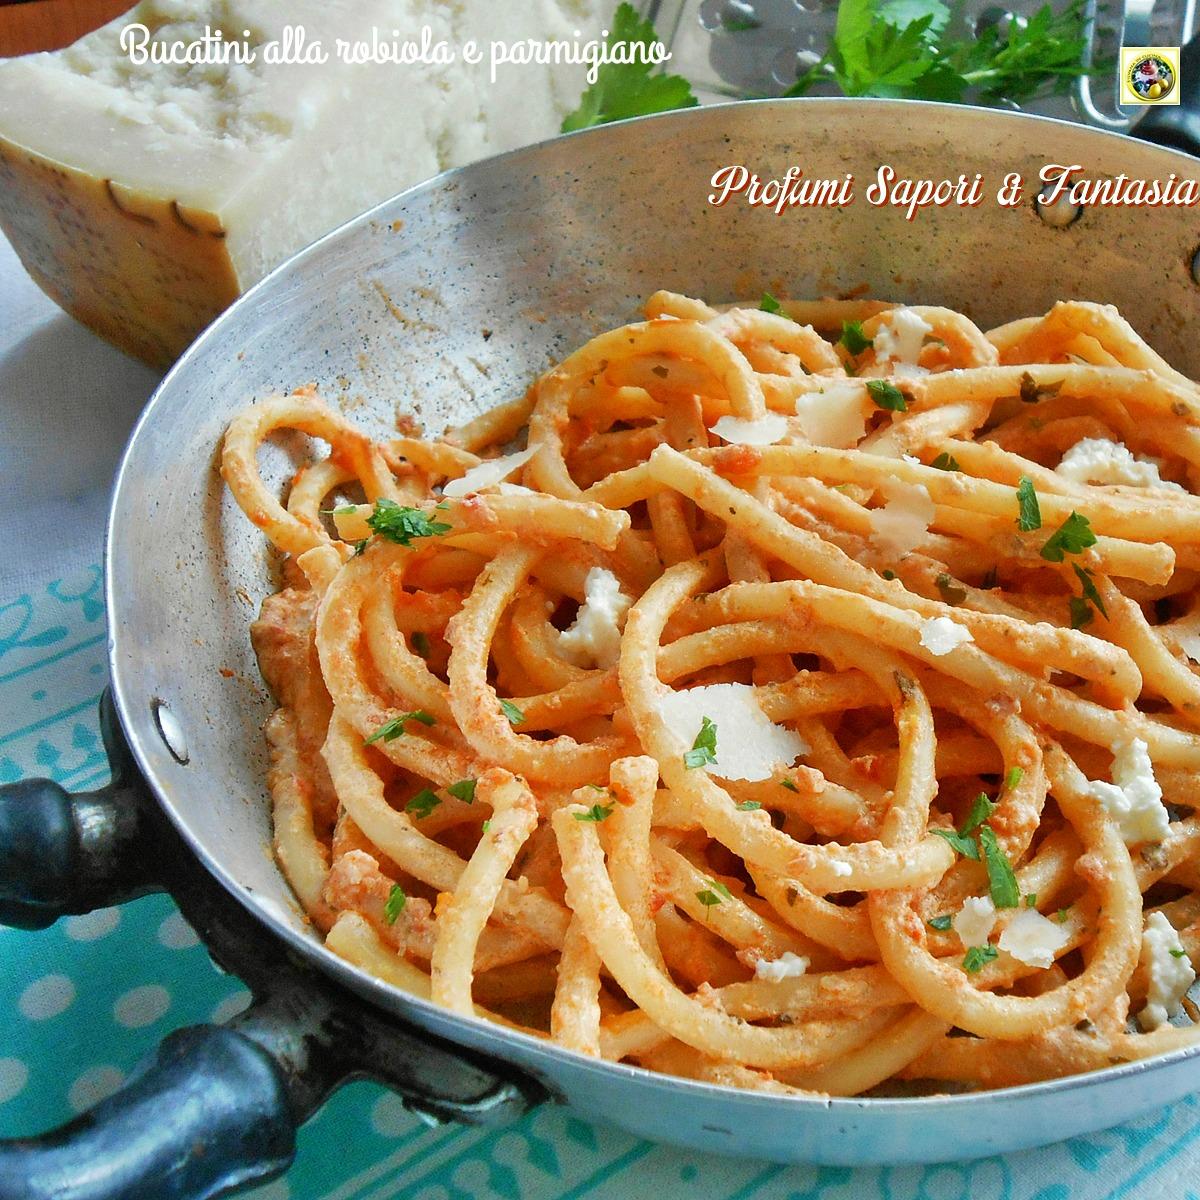 Bucatini alla robiola e parmigiano